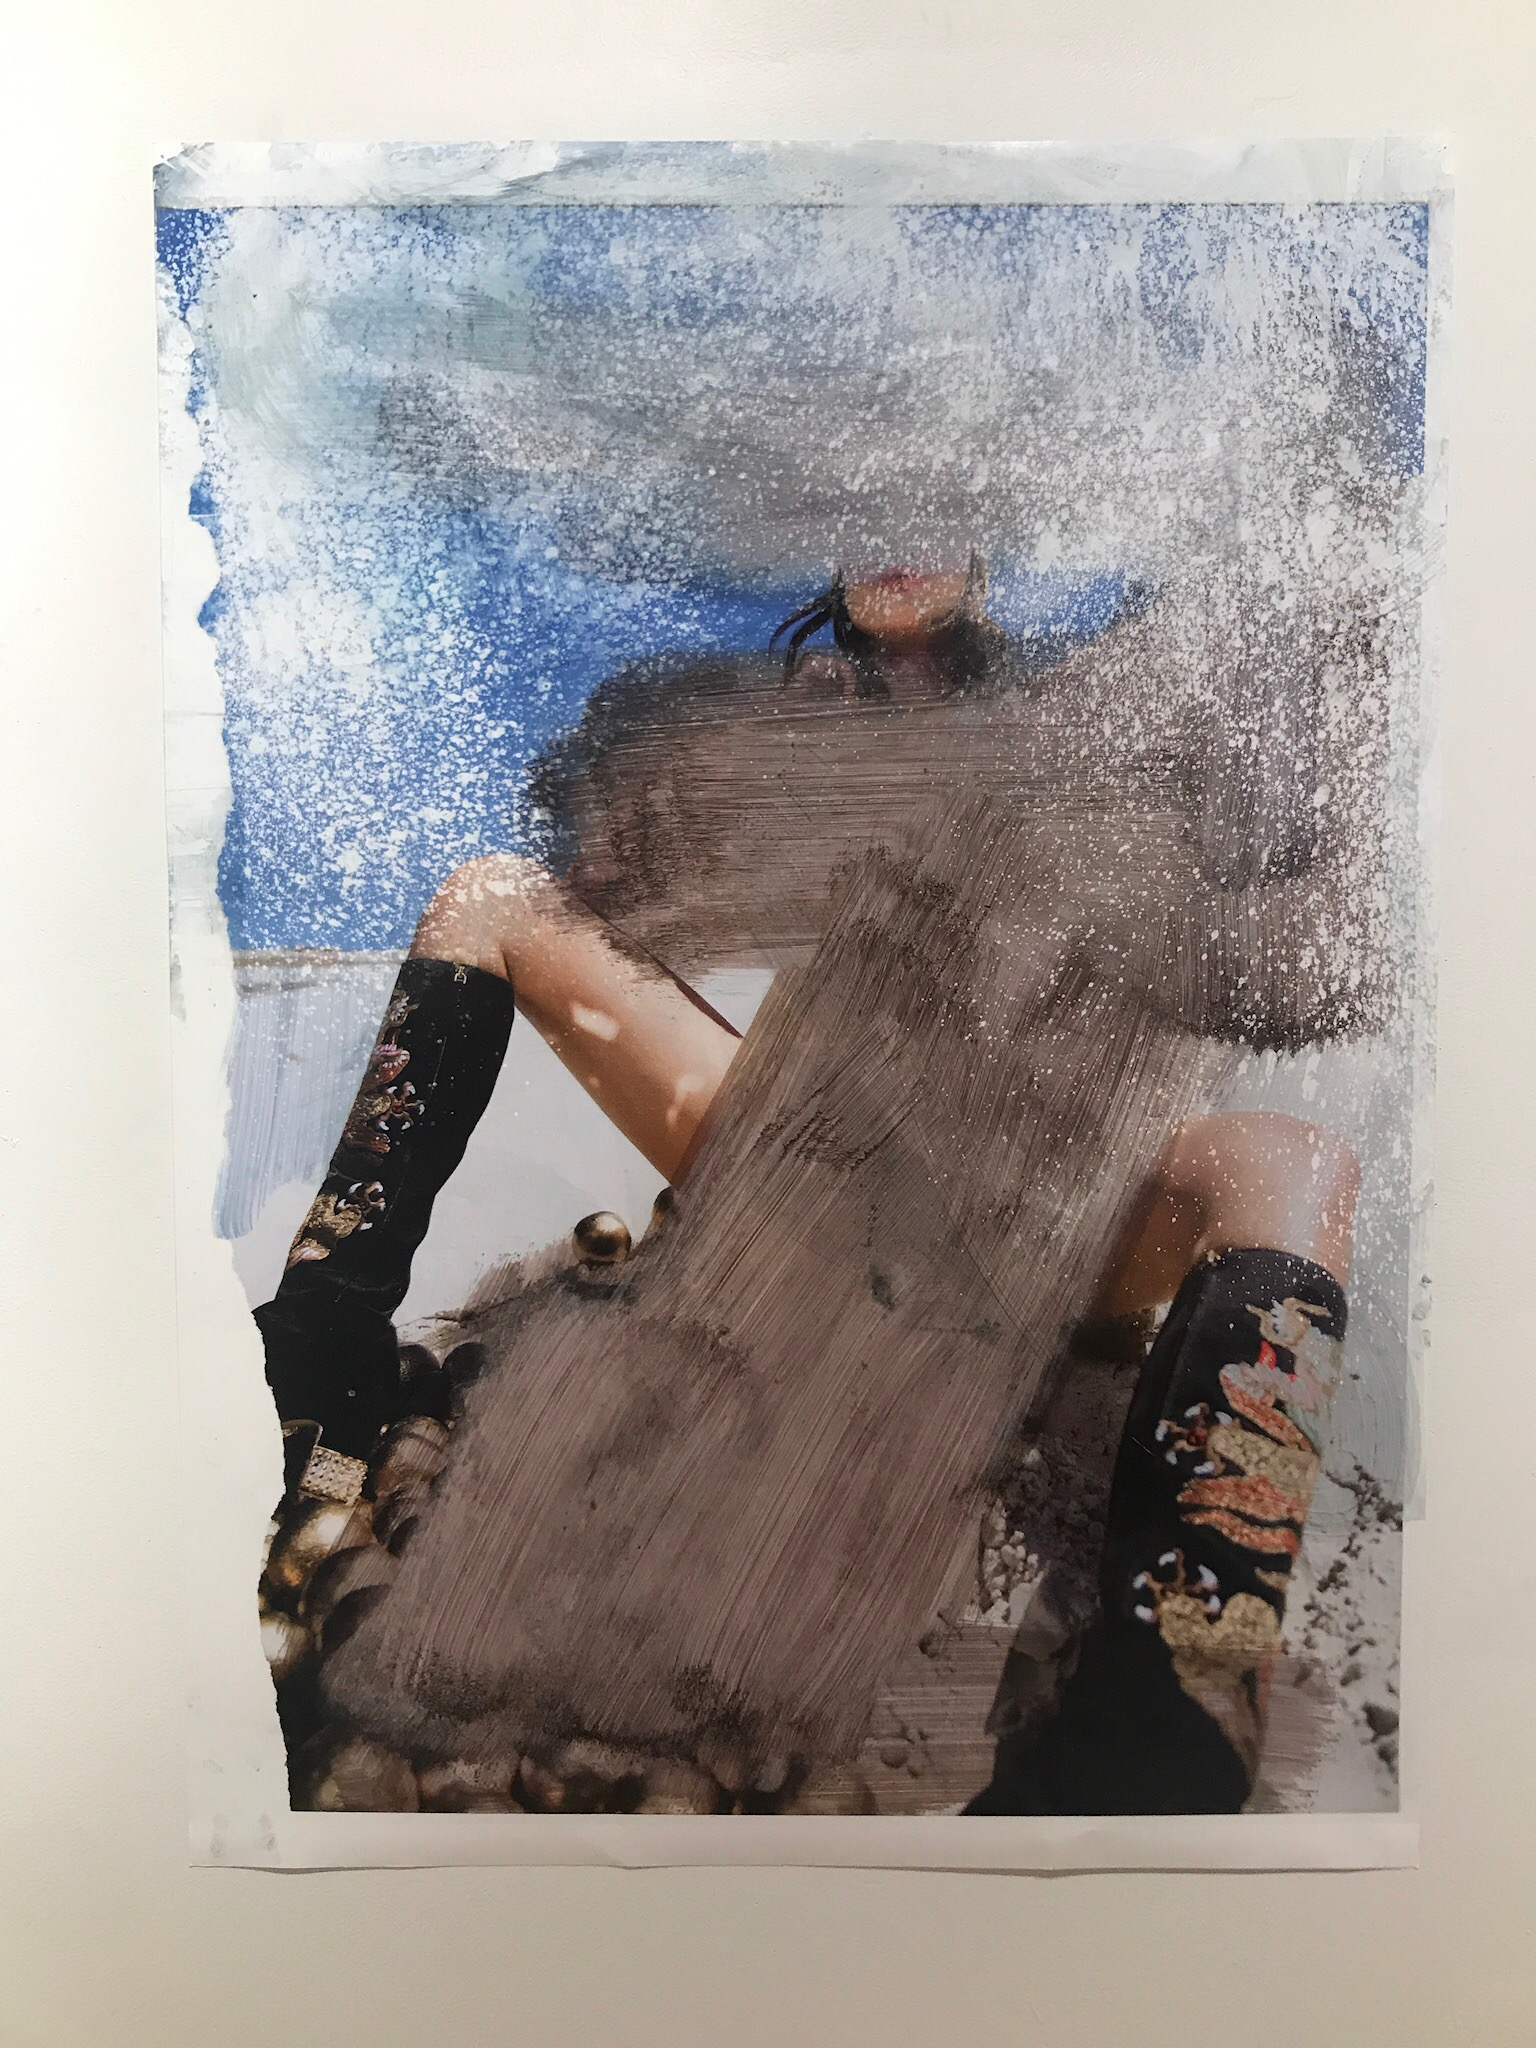 Objet de Désir 4   2017  49 x 36 in.  Citra solv on magazine, bleach on photo paper